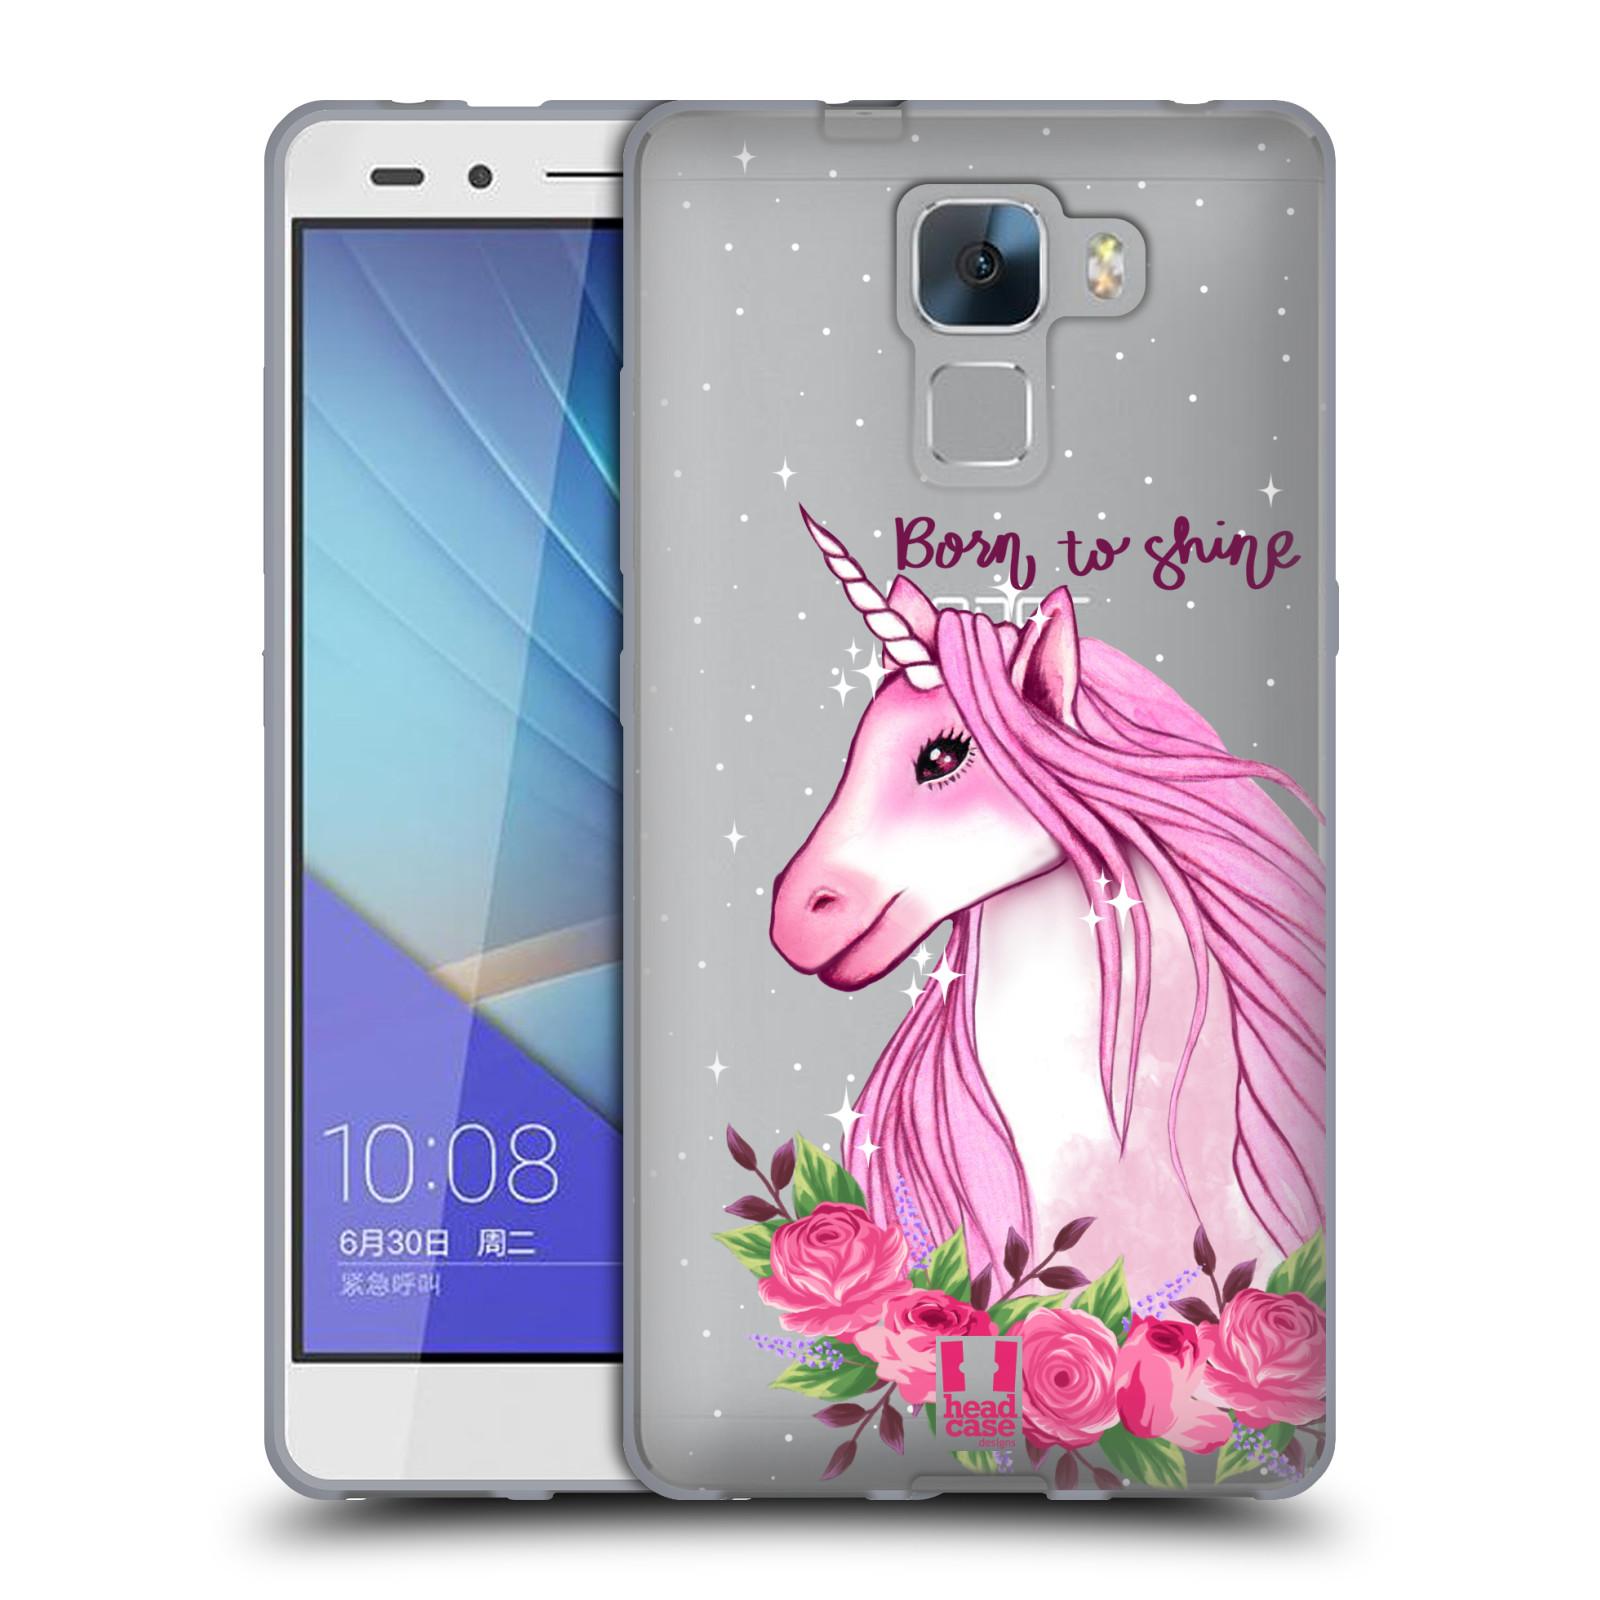 Silikonové pouzdro na mobil Honor 7 - Head Case - Jednorožec - Born to shine